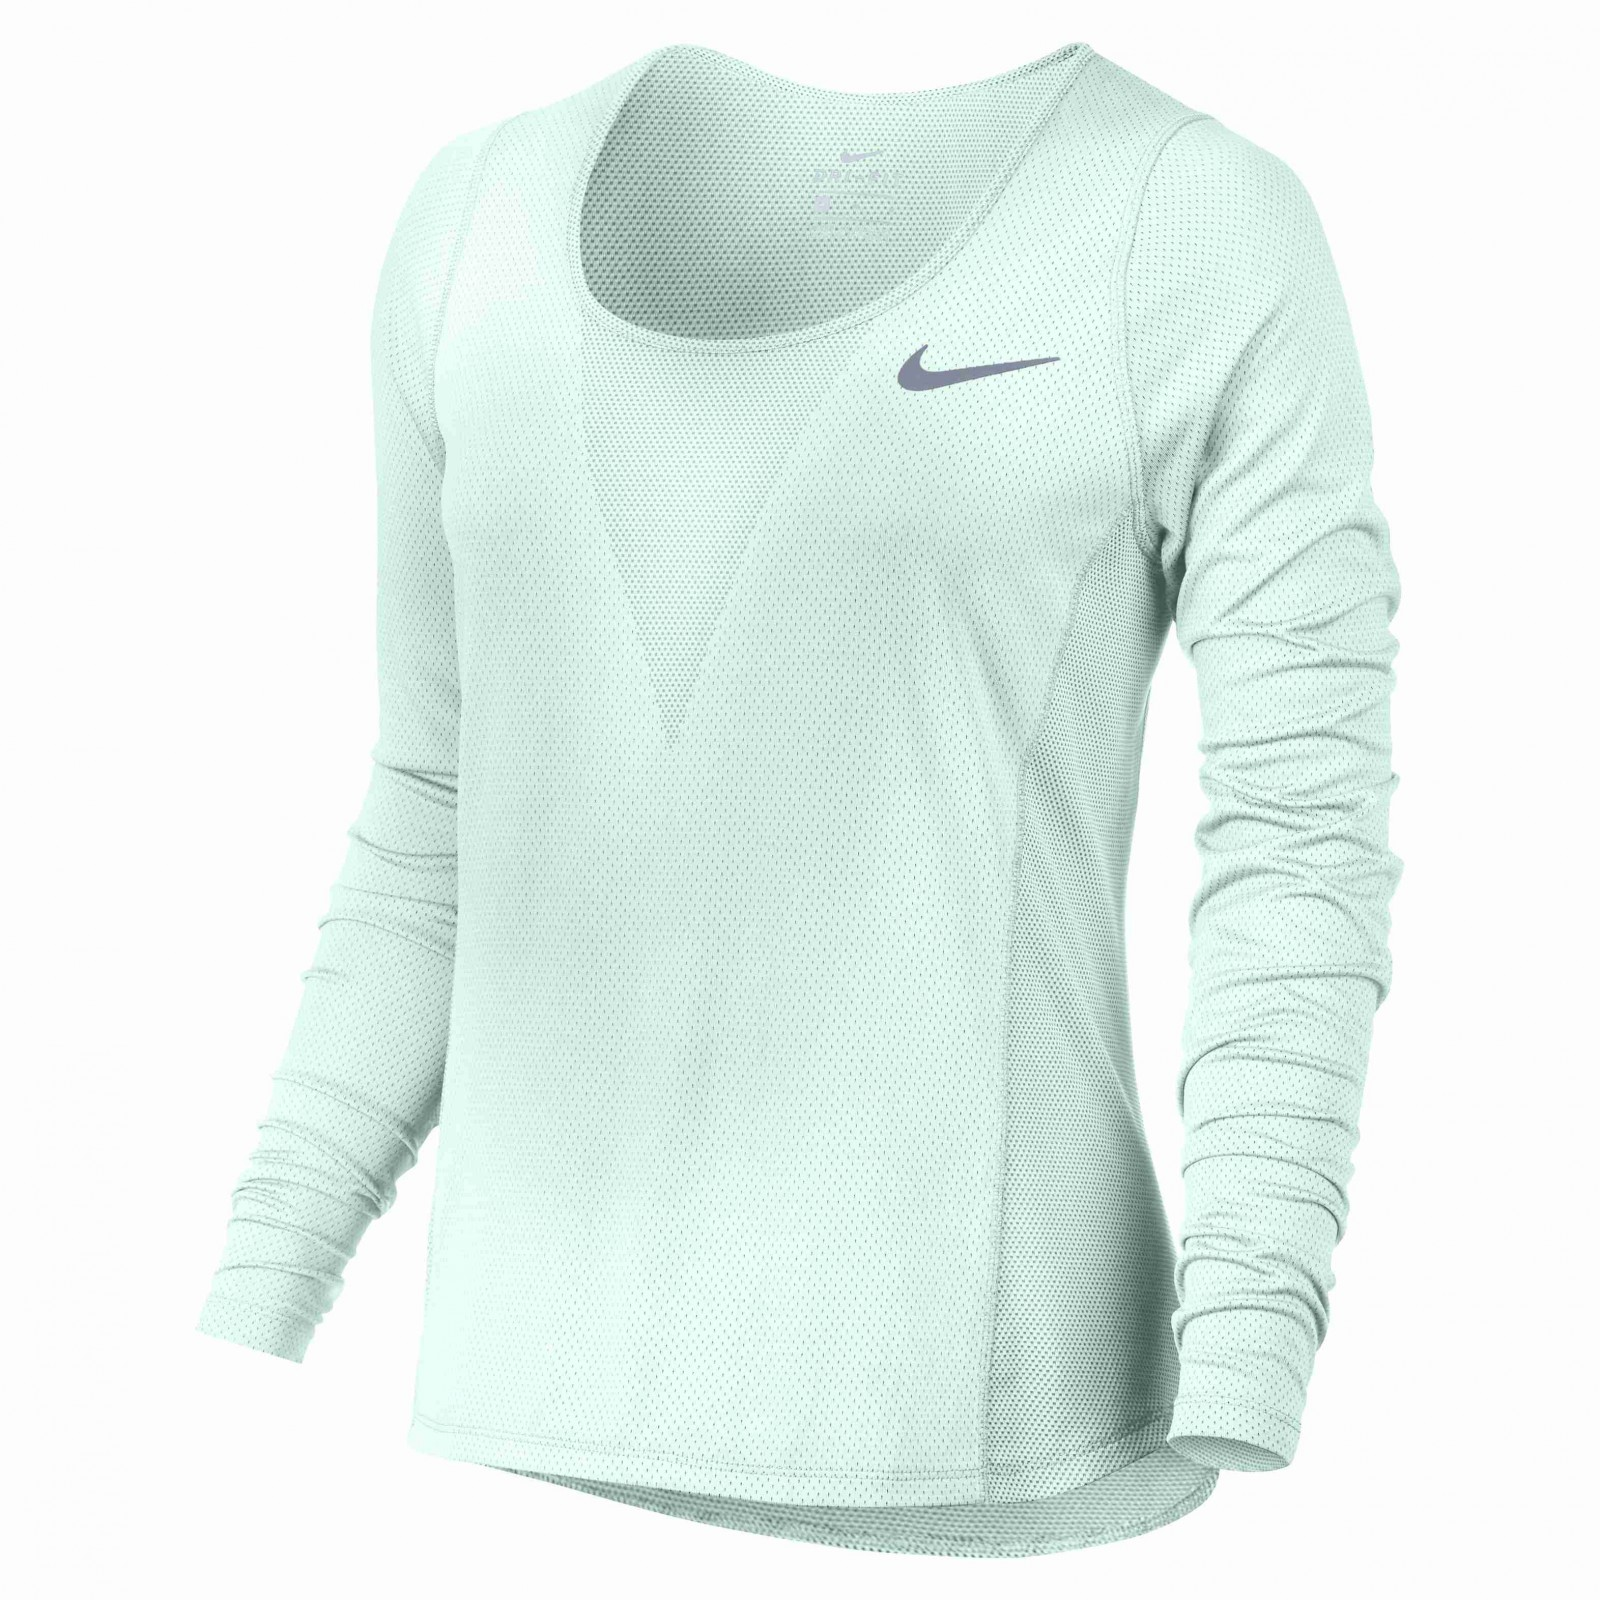 d0d356291386 Dámské tričko Nike W NK ZNL CL RELAY TOP LS